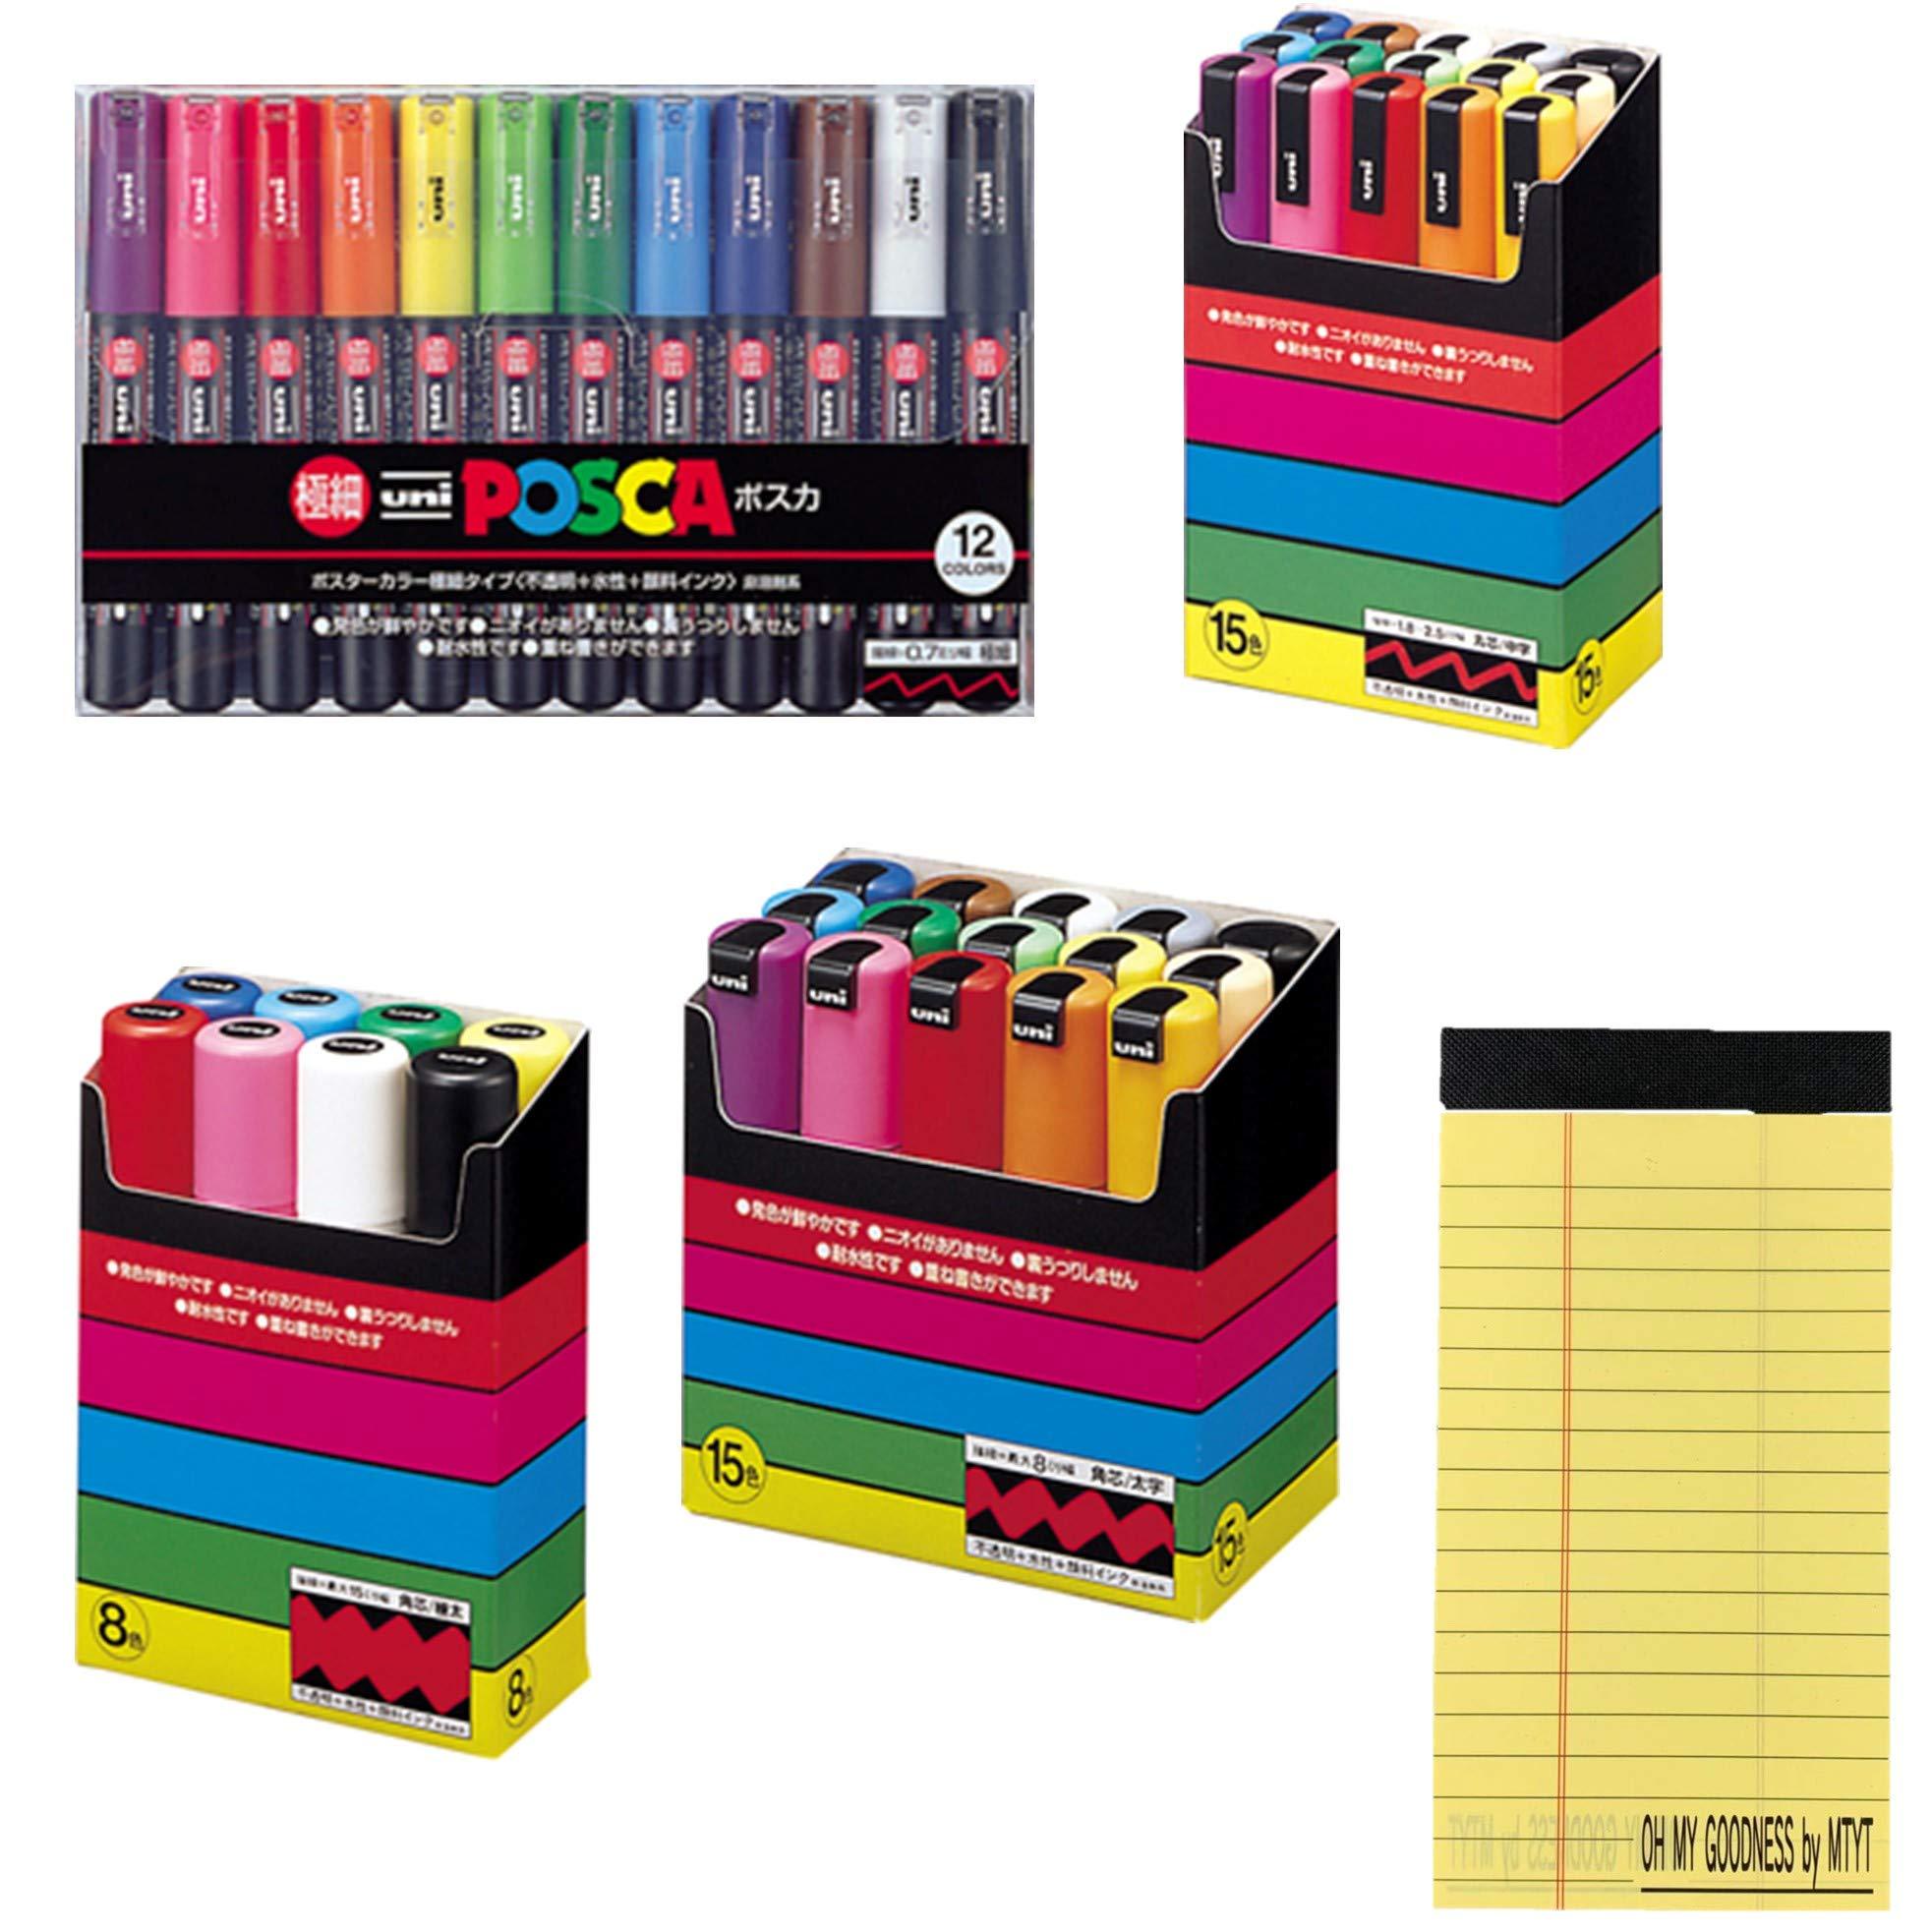 Posca Extra fine 12 Color Set( PC-1M12C)+Bold Square core 15 Colors Set( PC-8K 15C )+Medium Character Round core 15 Colors Set( PC-5M 15C)+Very Thick Square core 8 Color Set( PC-17K 8C)+ memo pad by Mitsubishi Pencil Co., Ltd.